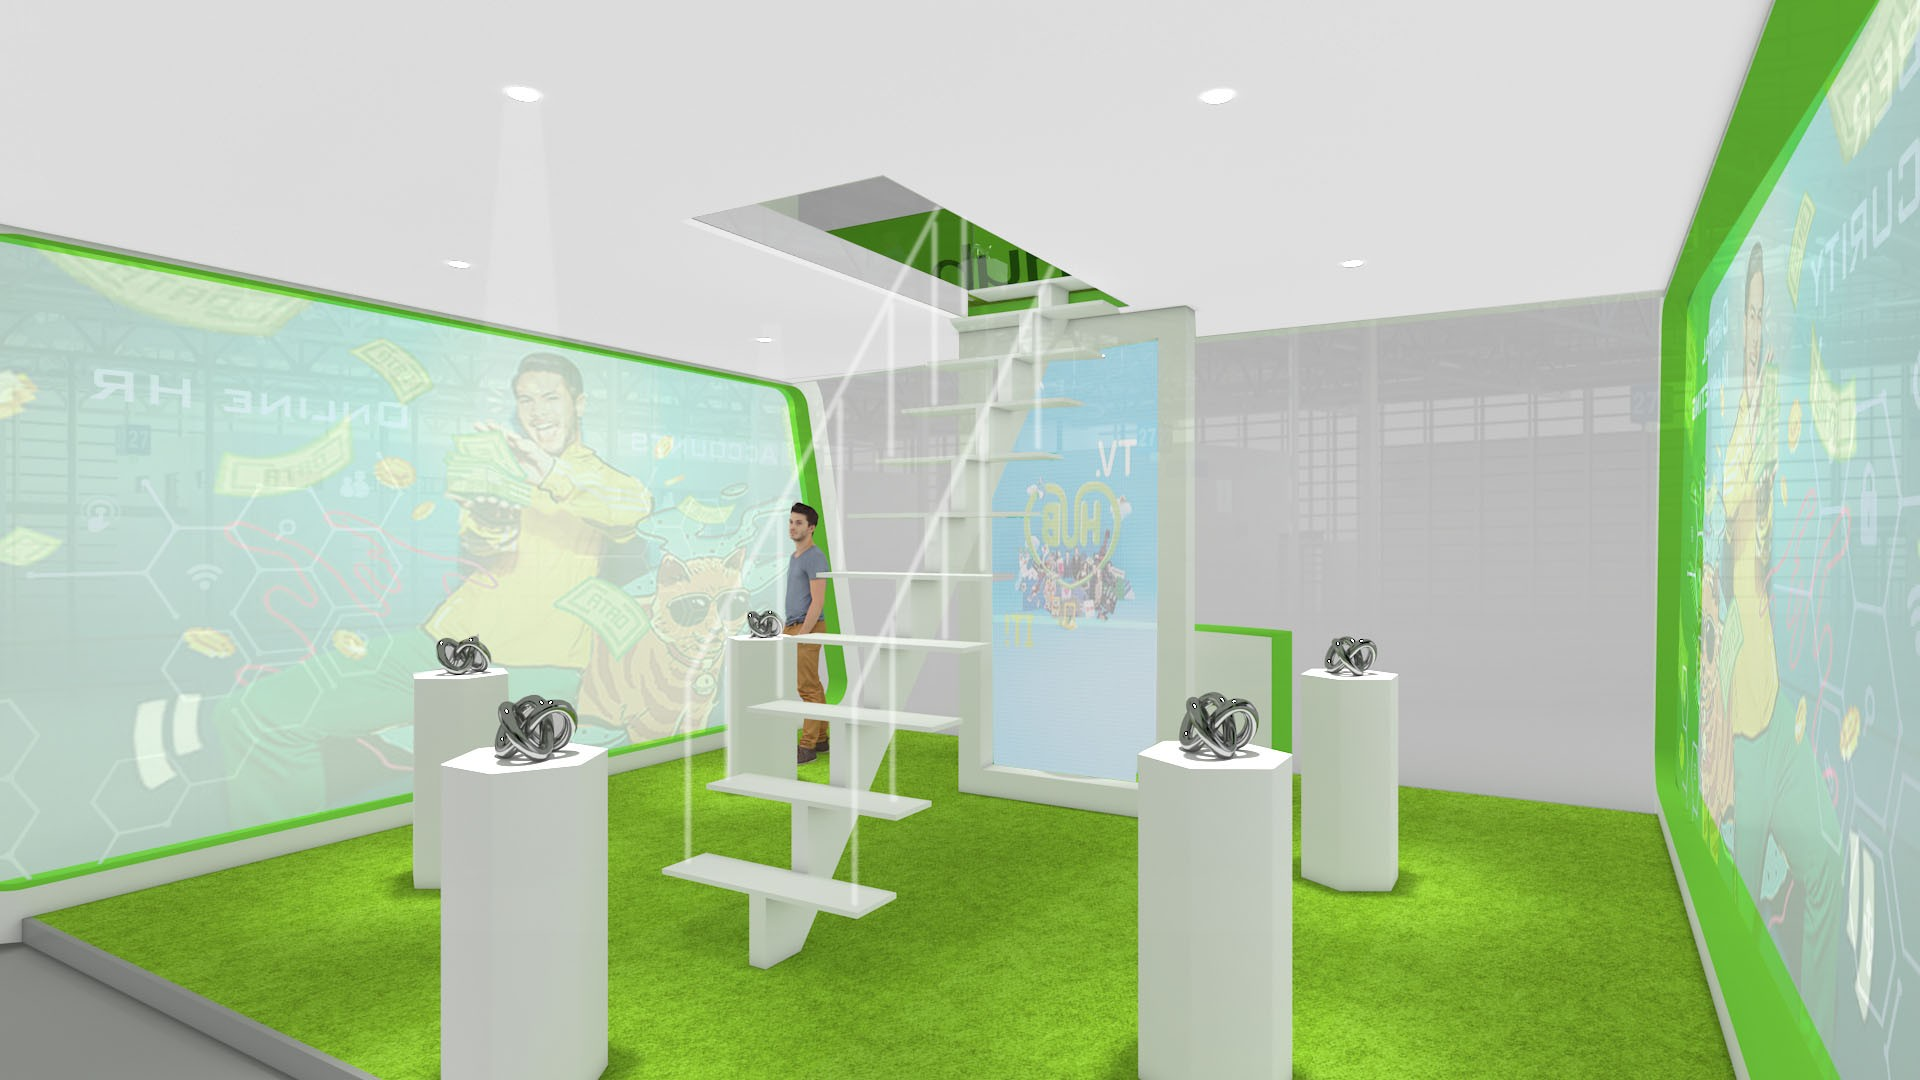 Telco brand exhibition booth custom design